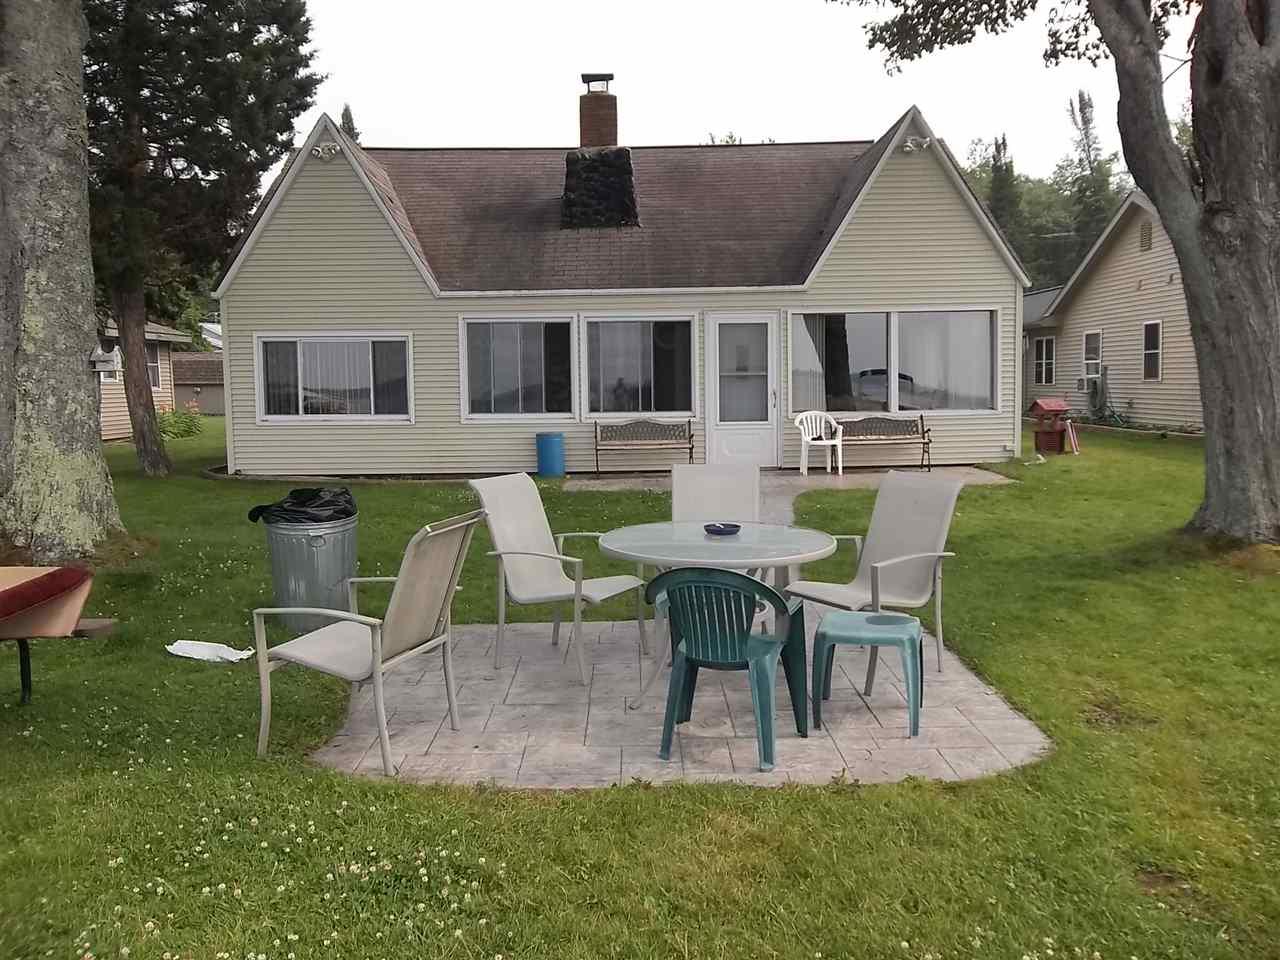 Real Estate for Sale, ListingId: 34270030, St Helen,MI48656